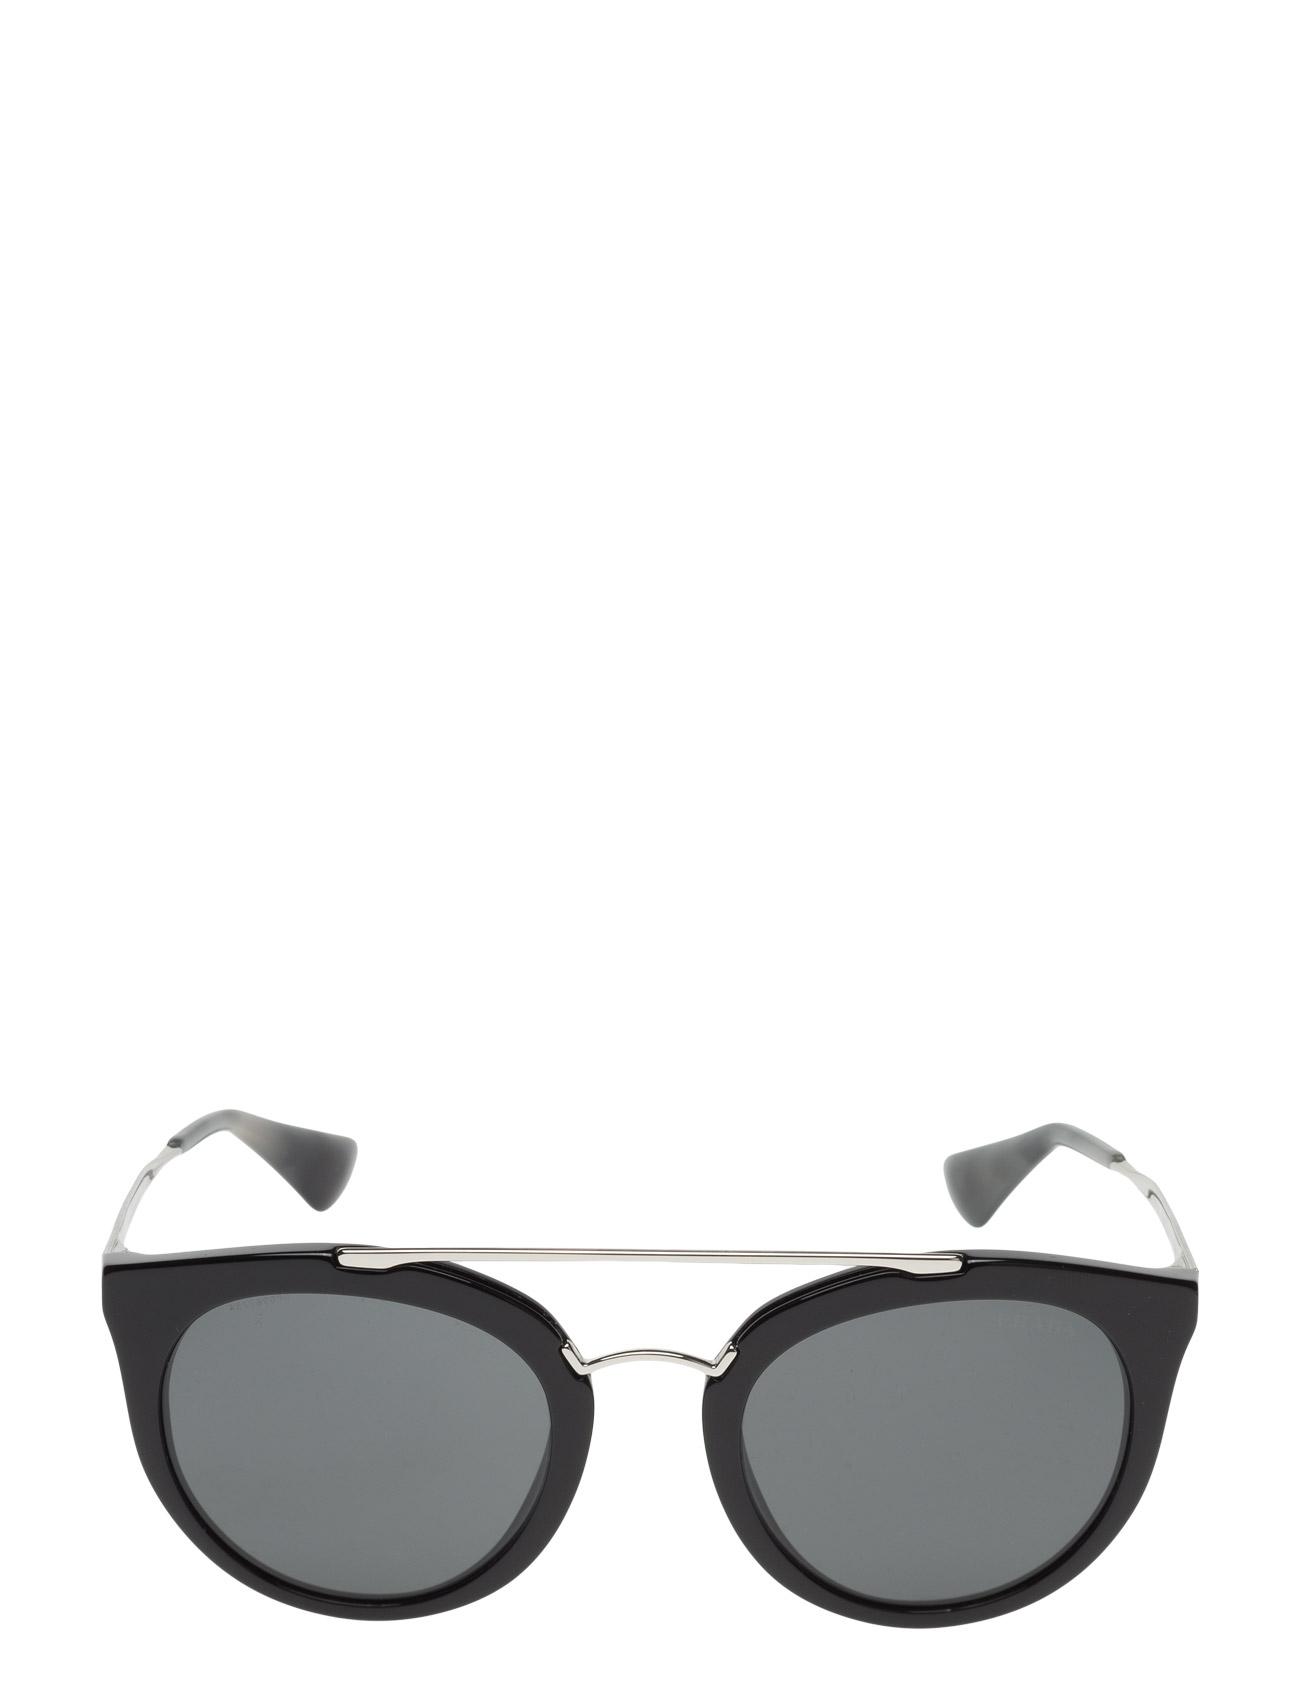 Cinema Prada Sunglasses Solbriller til Damer i